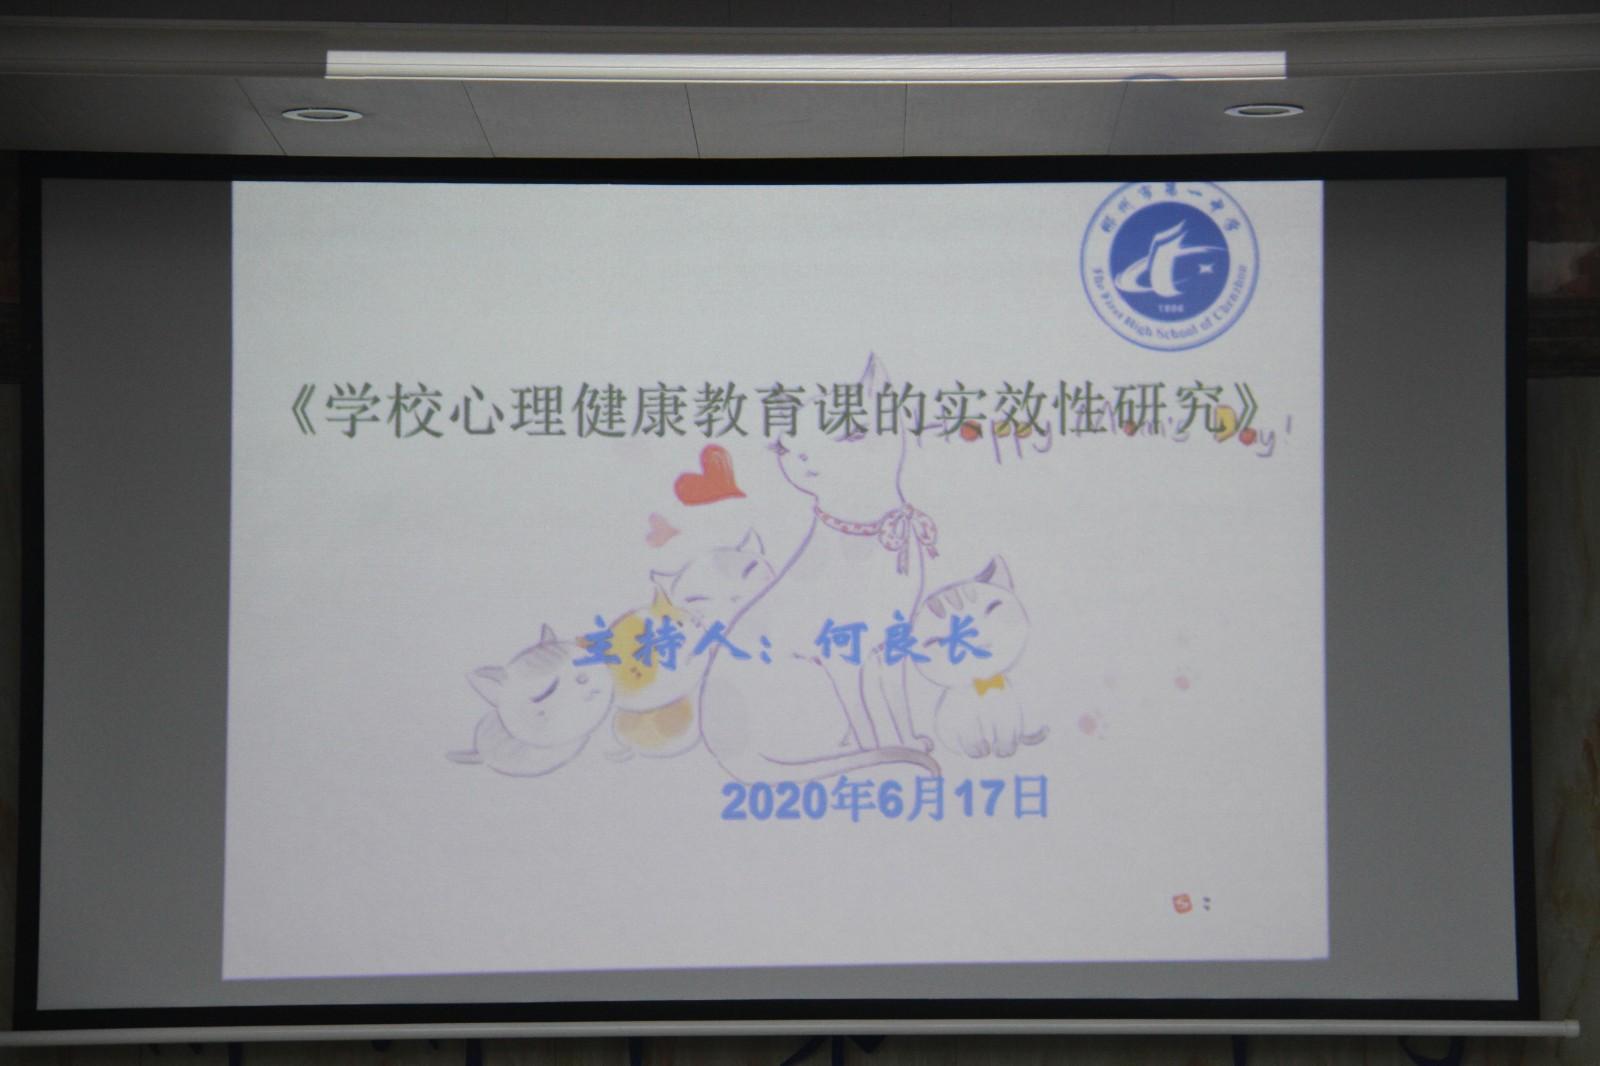 IMG_3408_爱奇艺.jpg